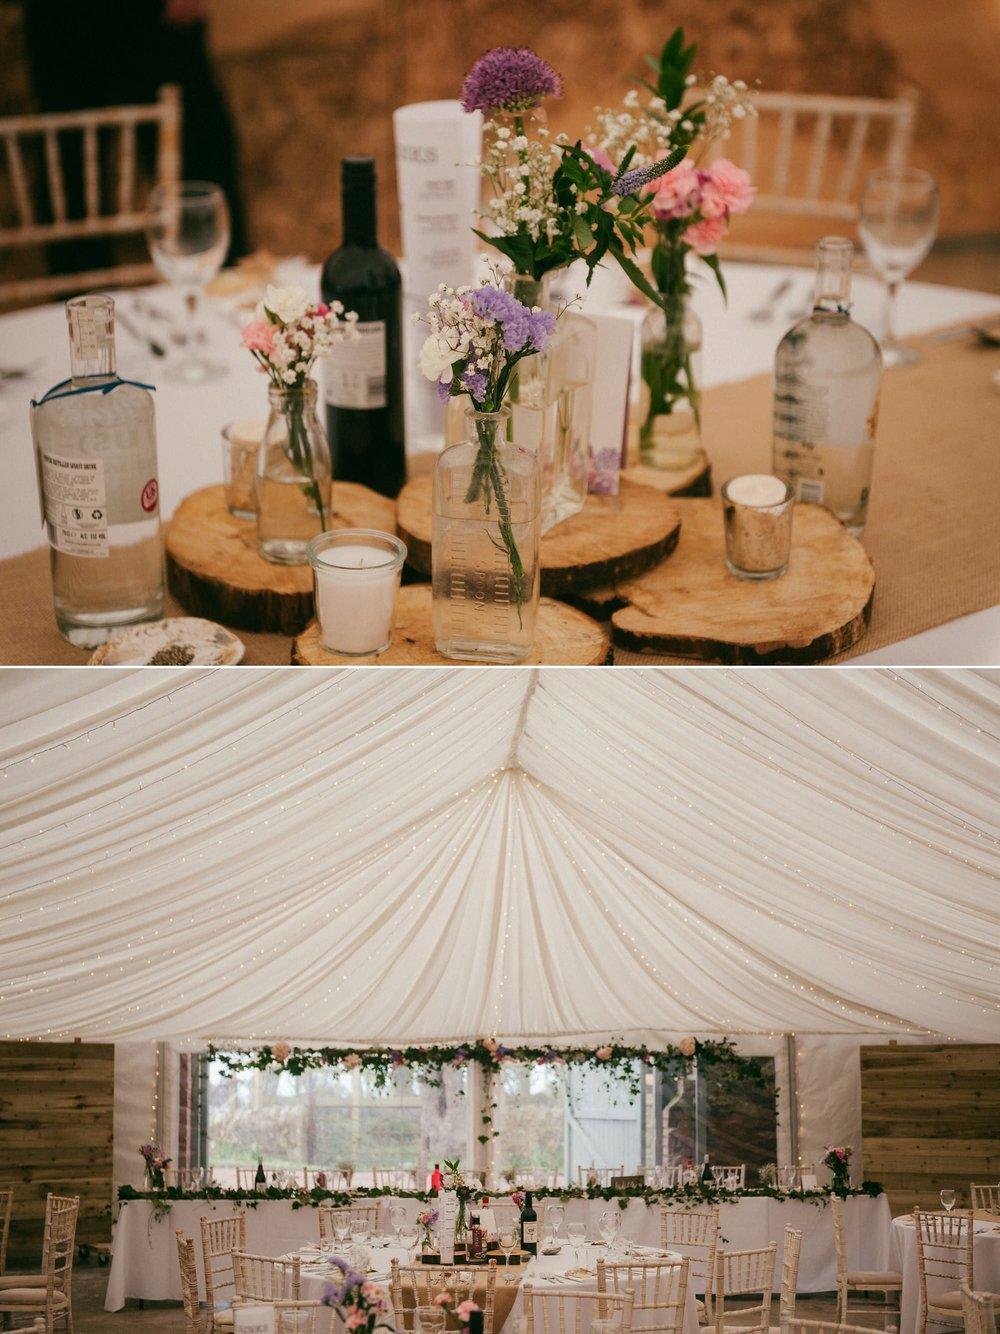 cowshed-barn-wedding-crail-98.jpg